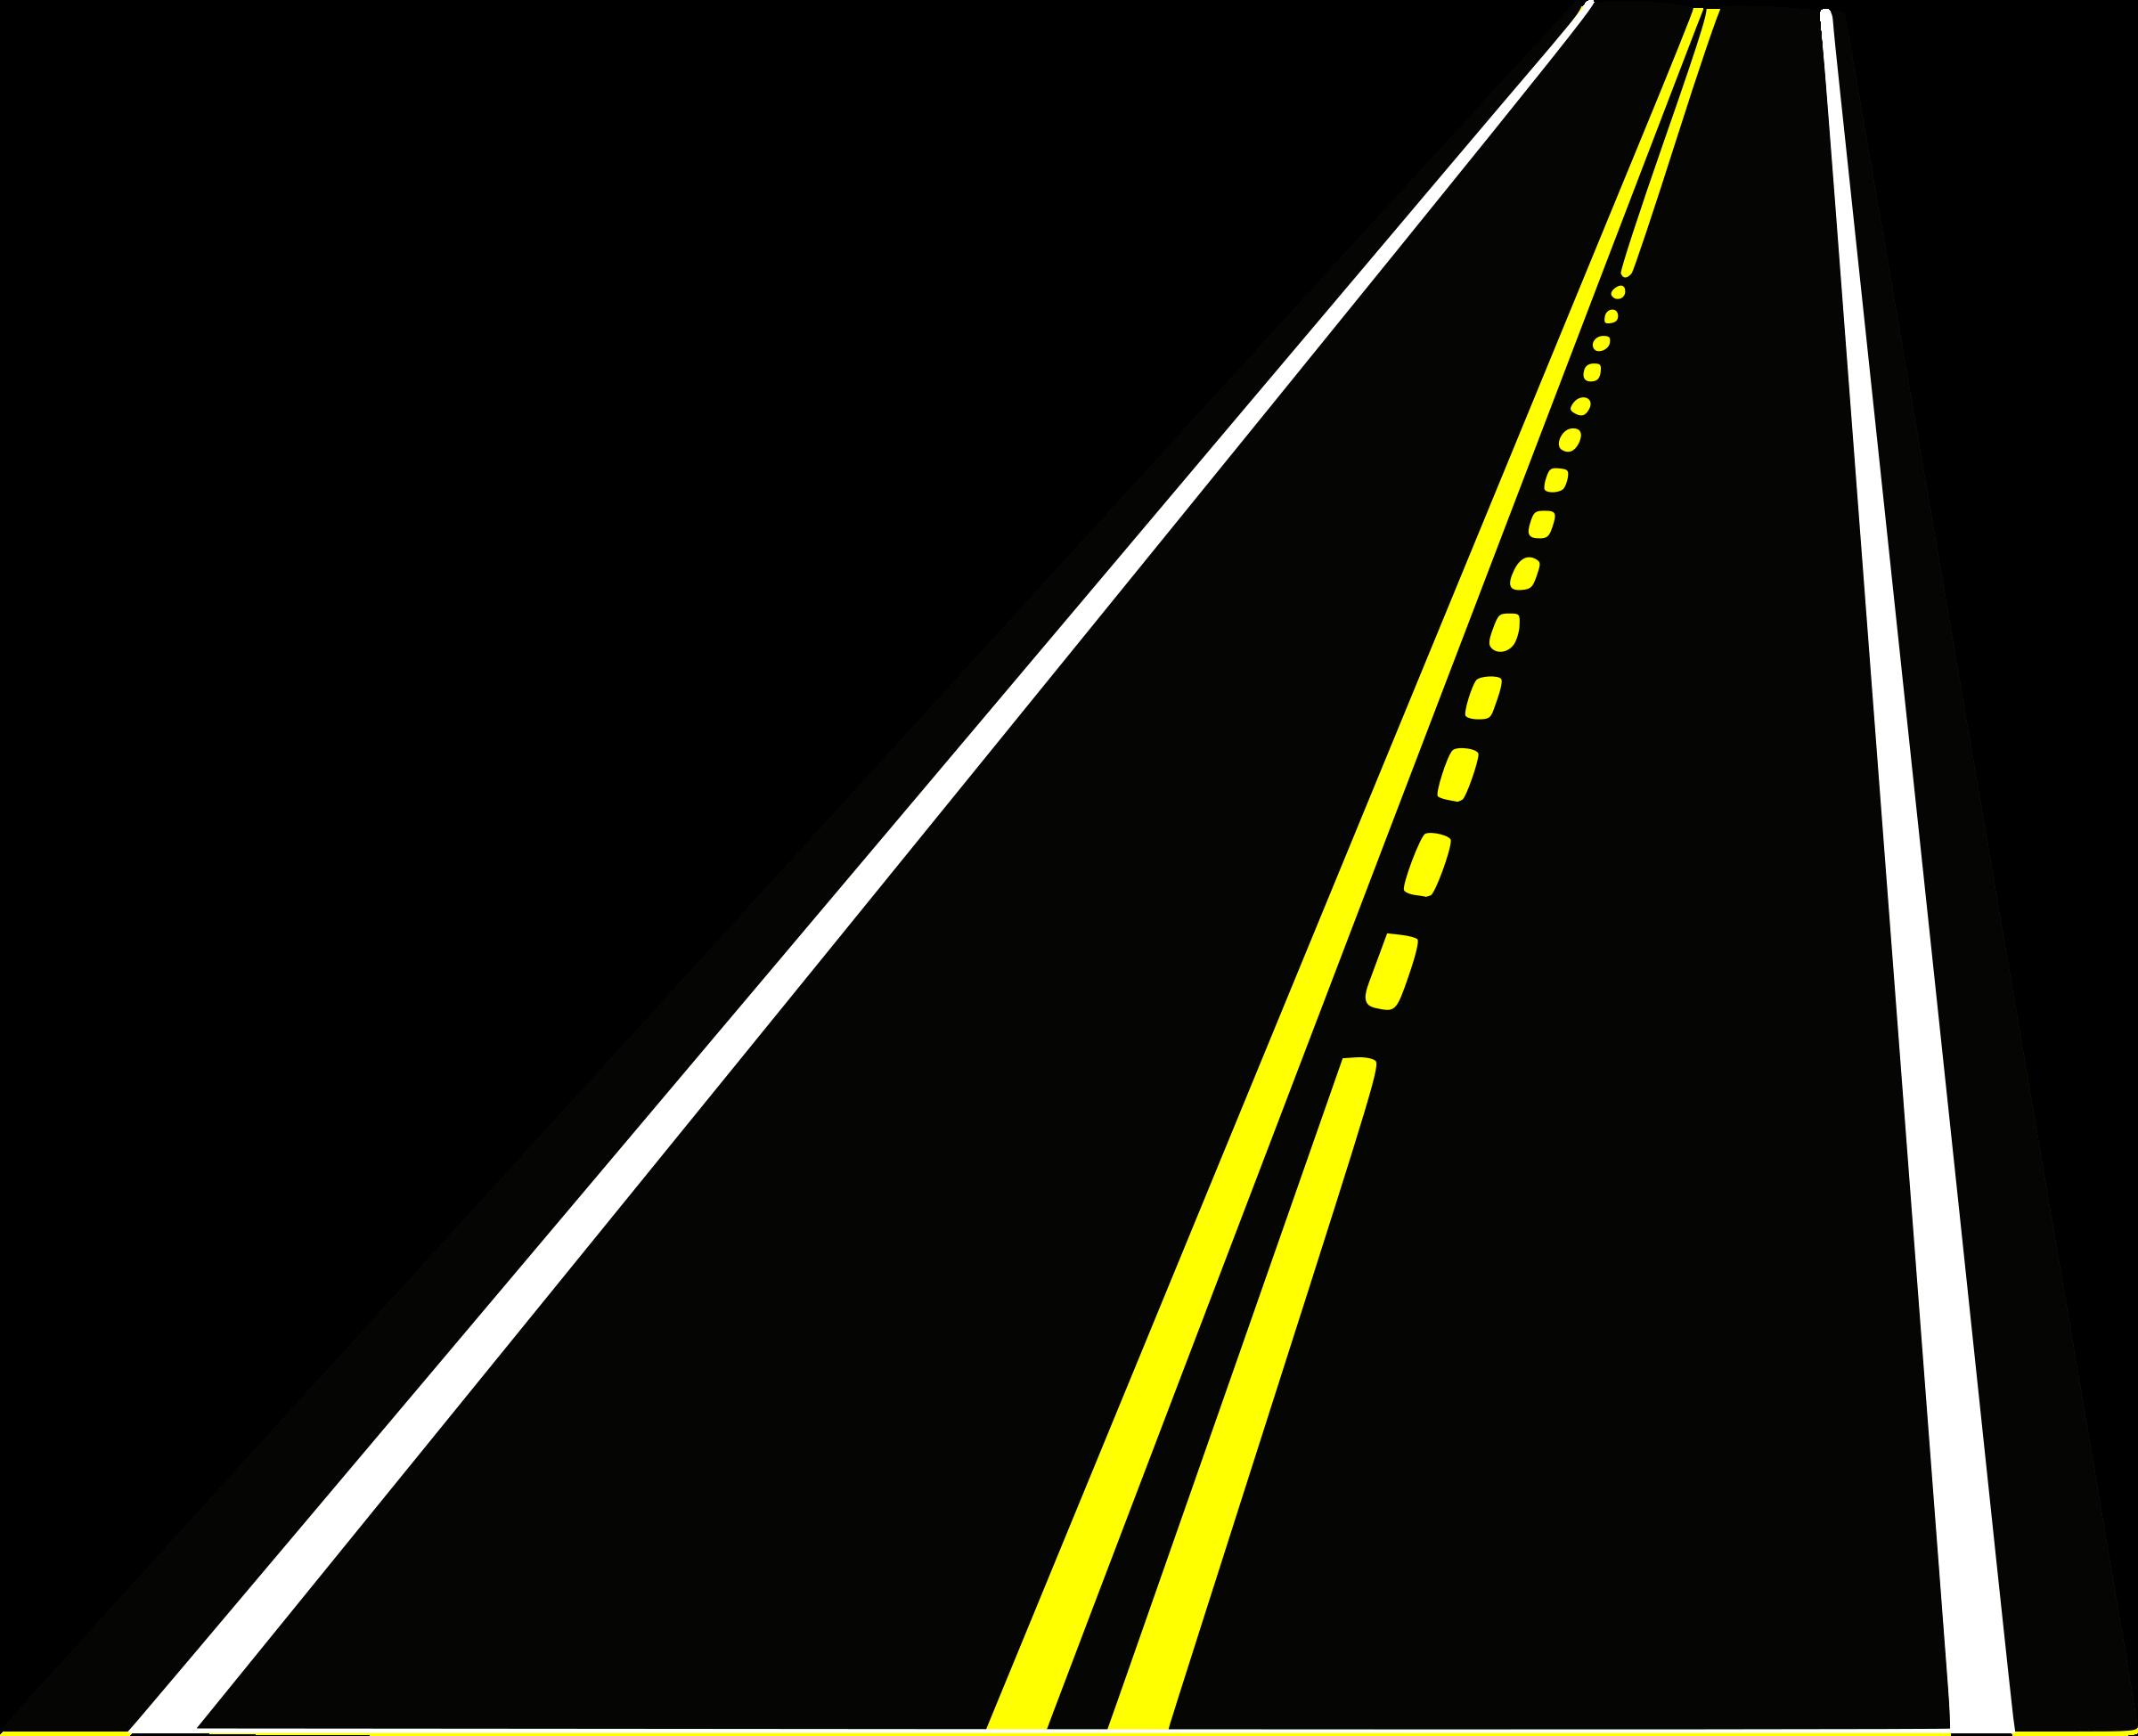 Road PNG Image